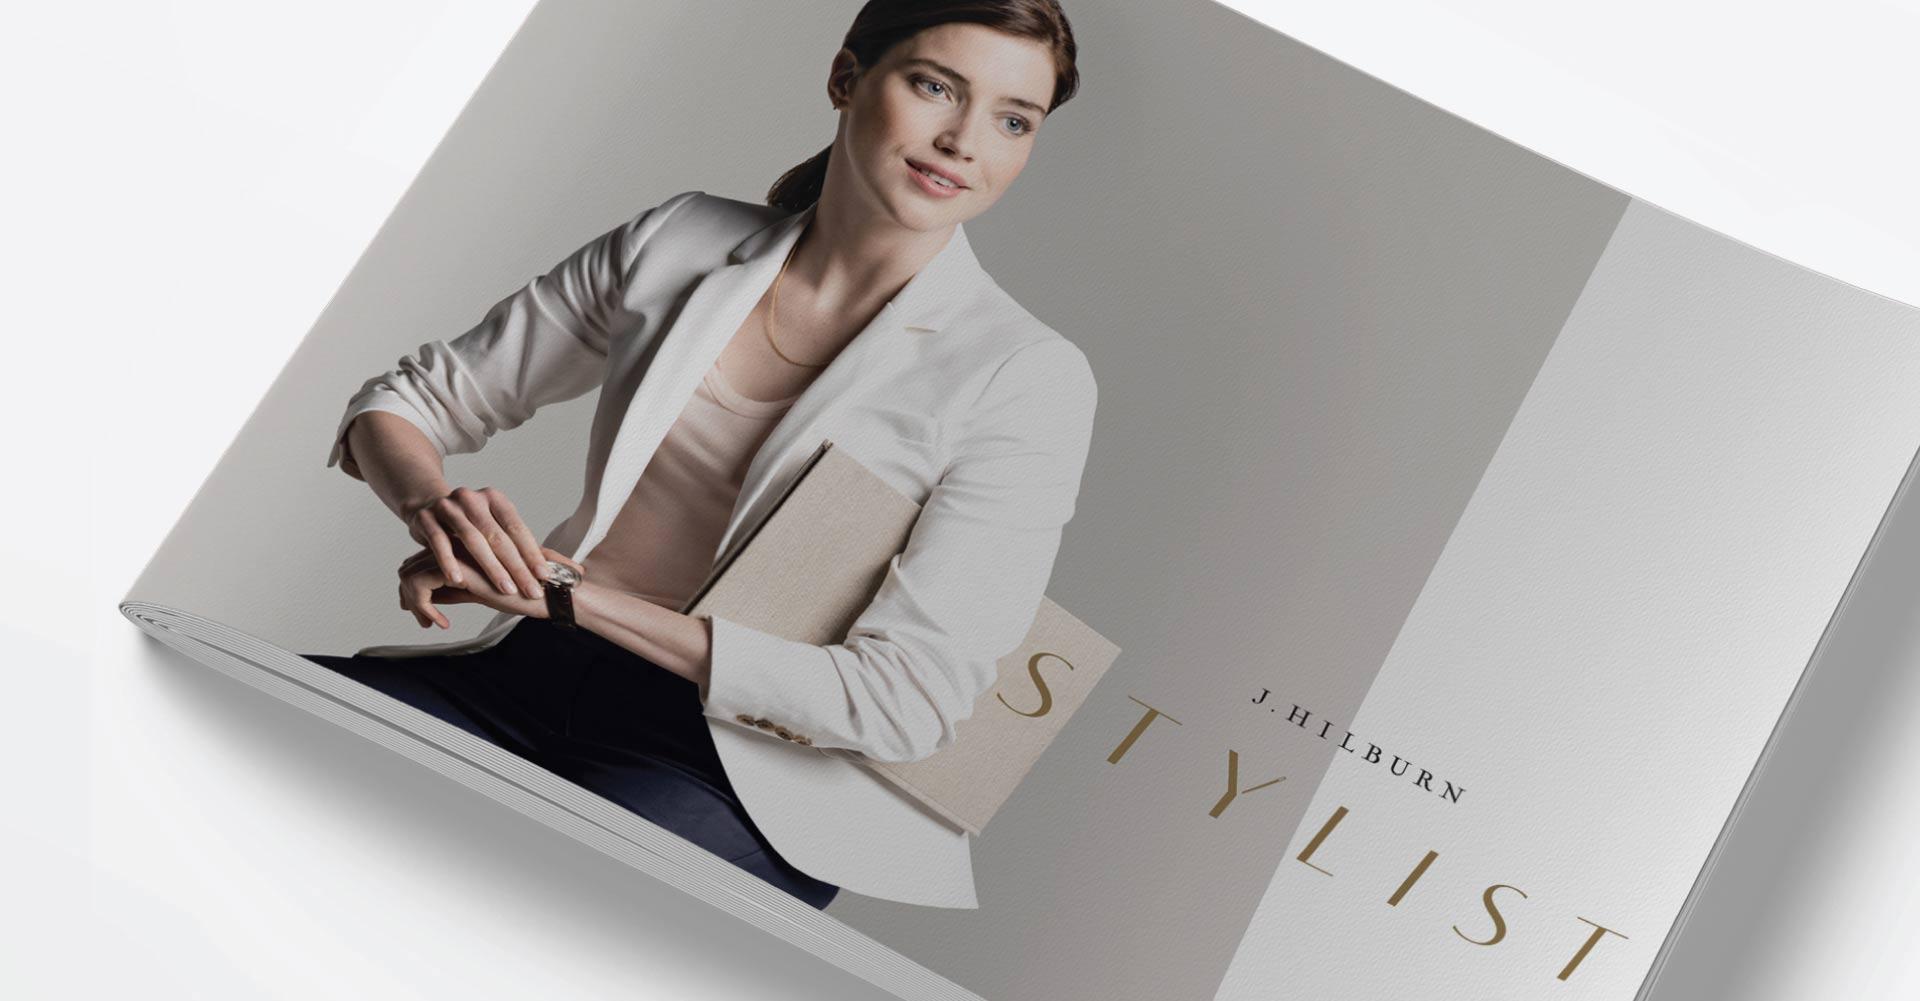 Creative_Retail_Packaging_Branding_Identity_Web_Design_JHilburn_2.jpg